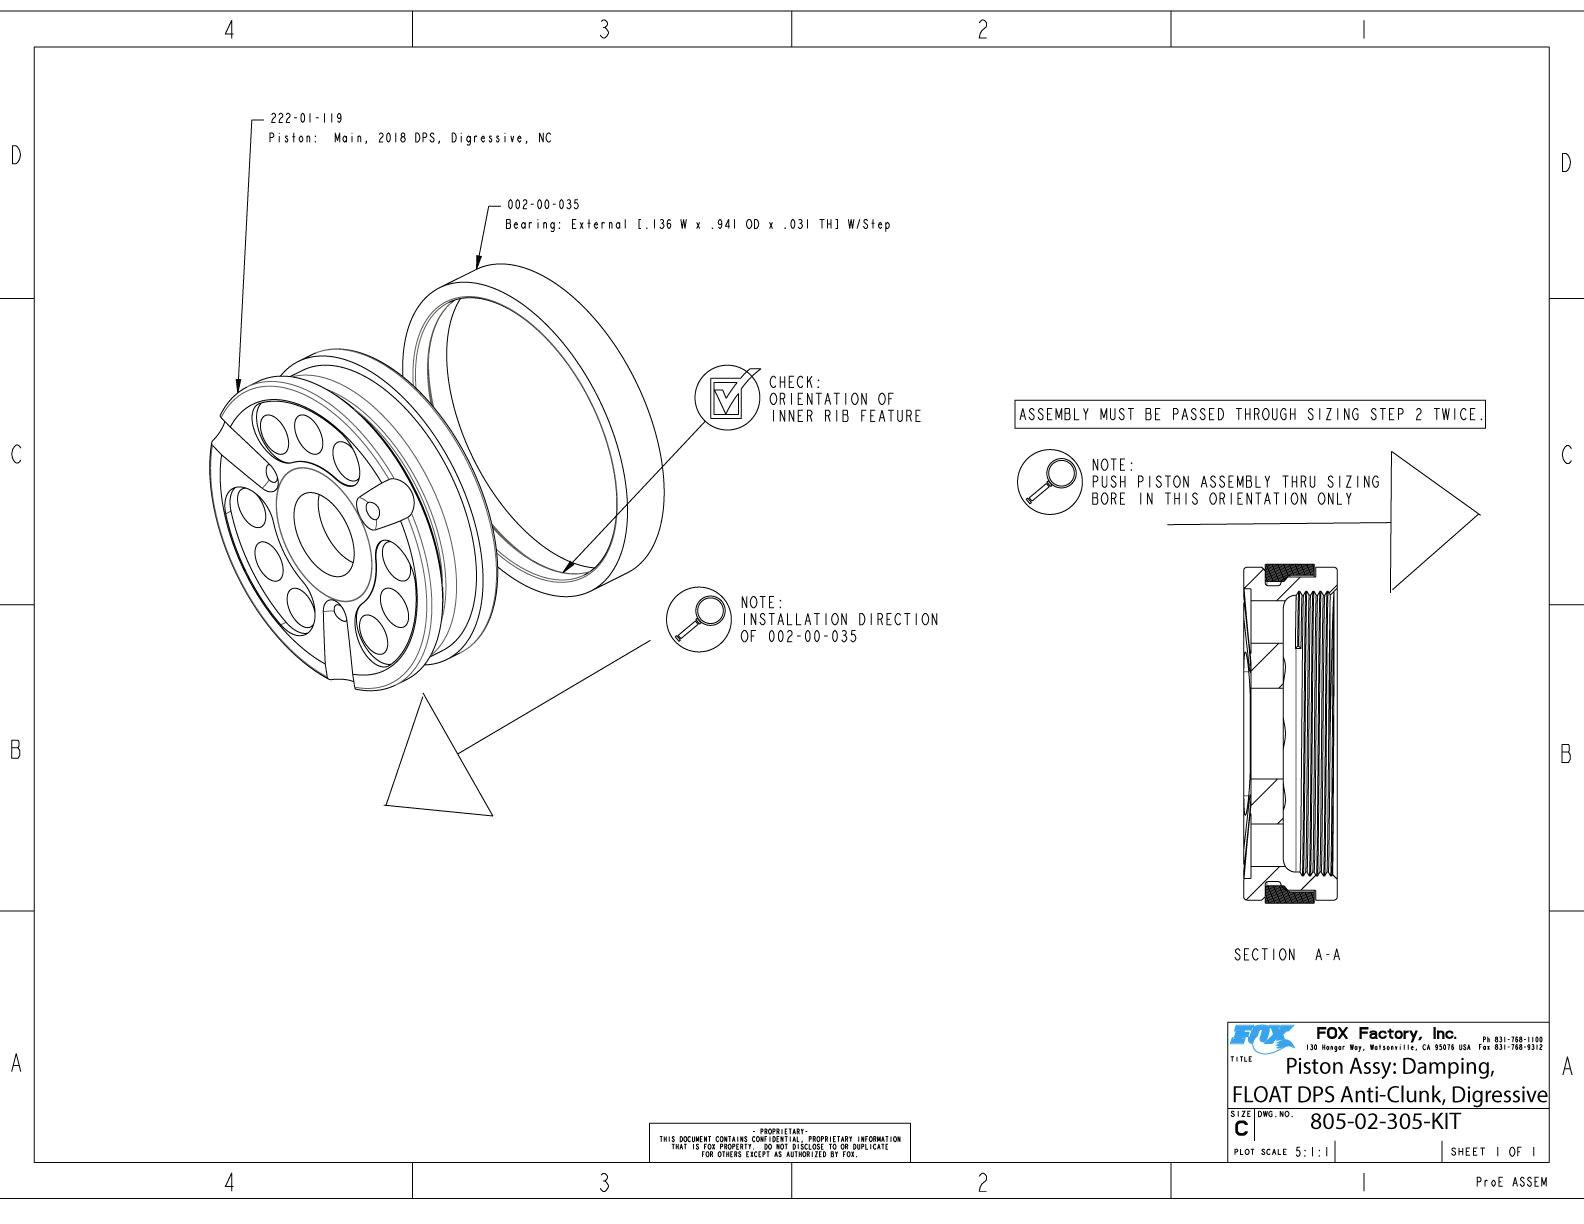 805 02 305 kit piston assy damping float dps anti clunk digressive